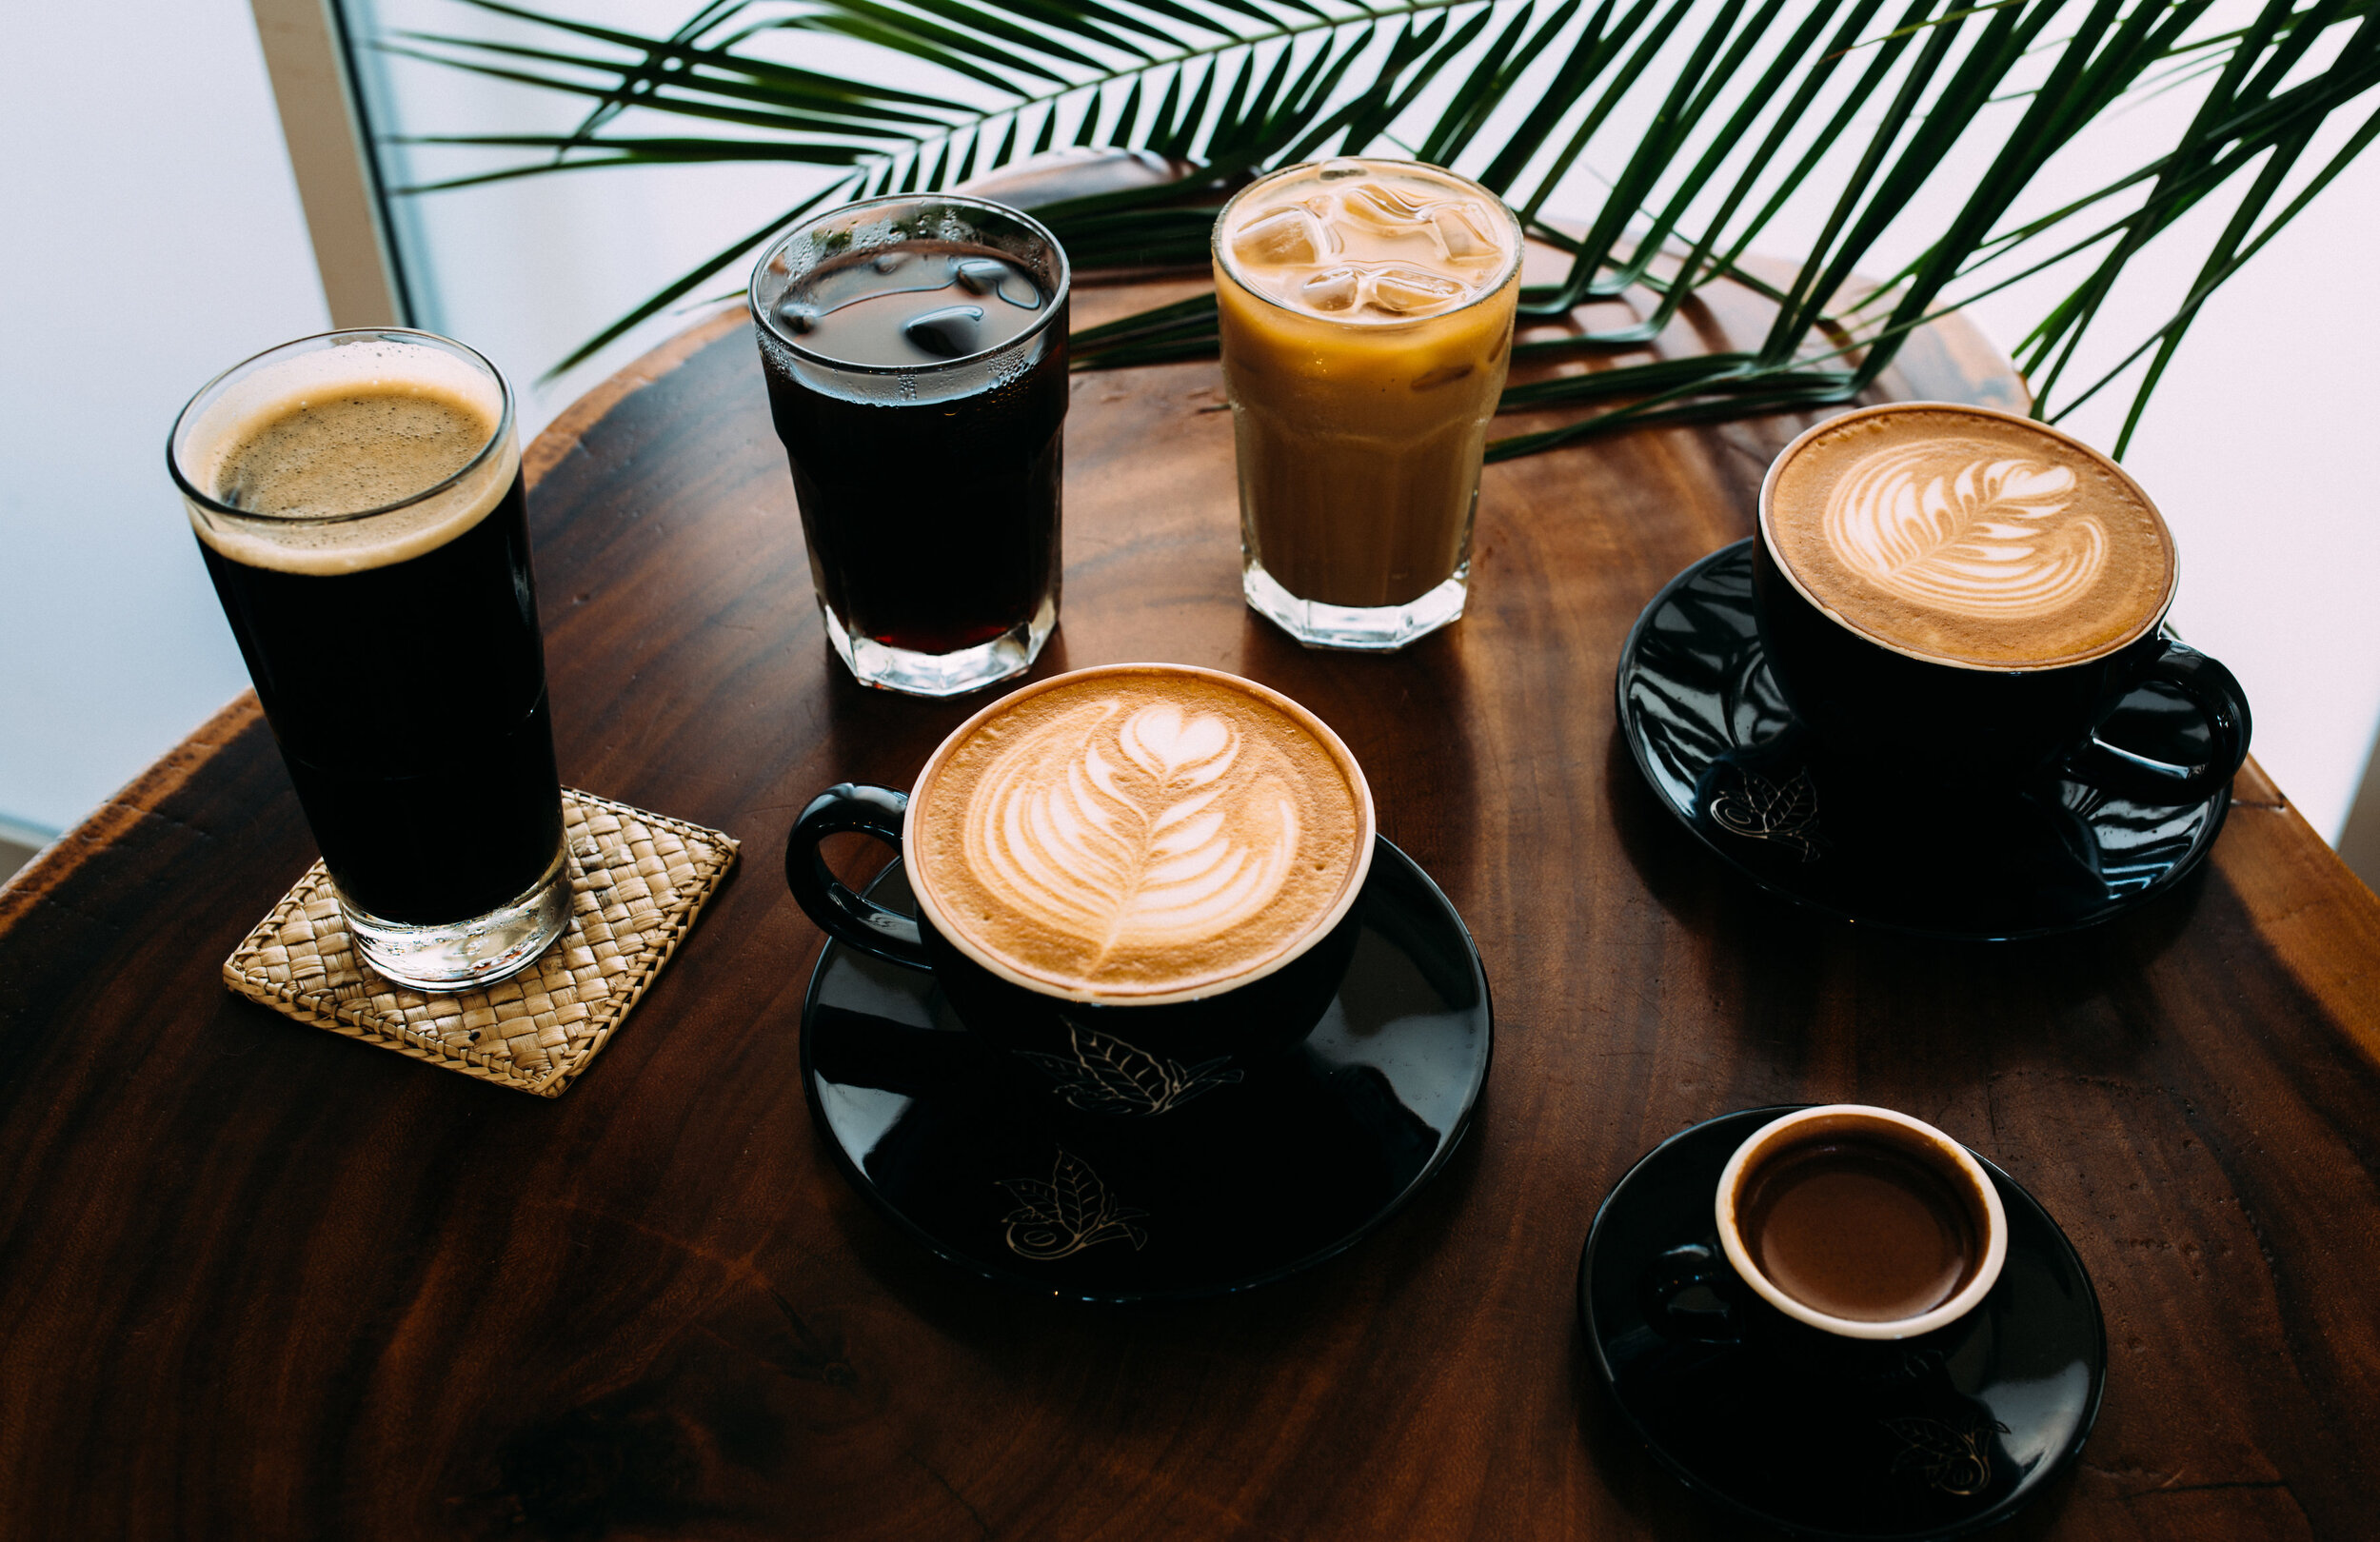 Kona Coffee and Tea Cafe Drinks-19_By Blake Wisz.JPG